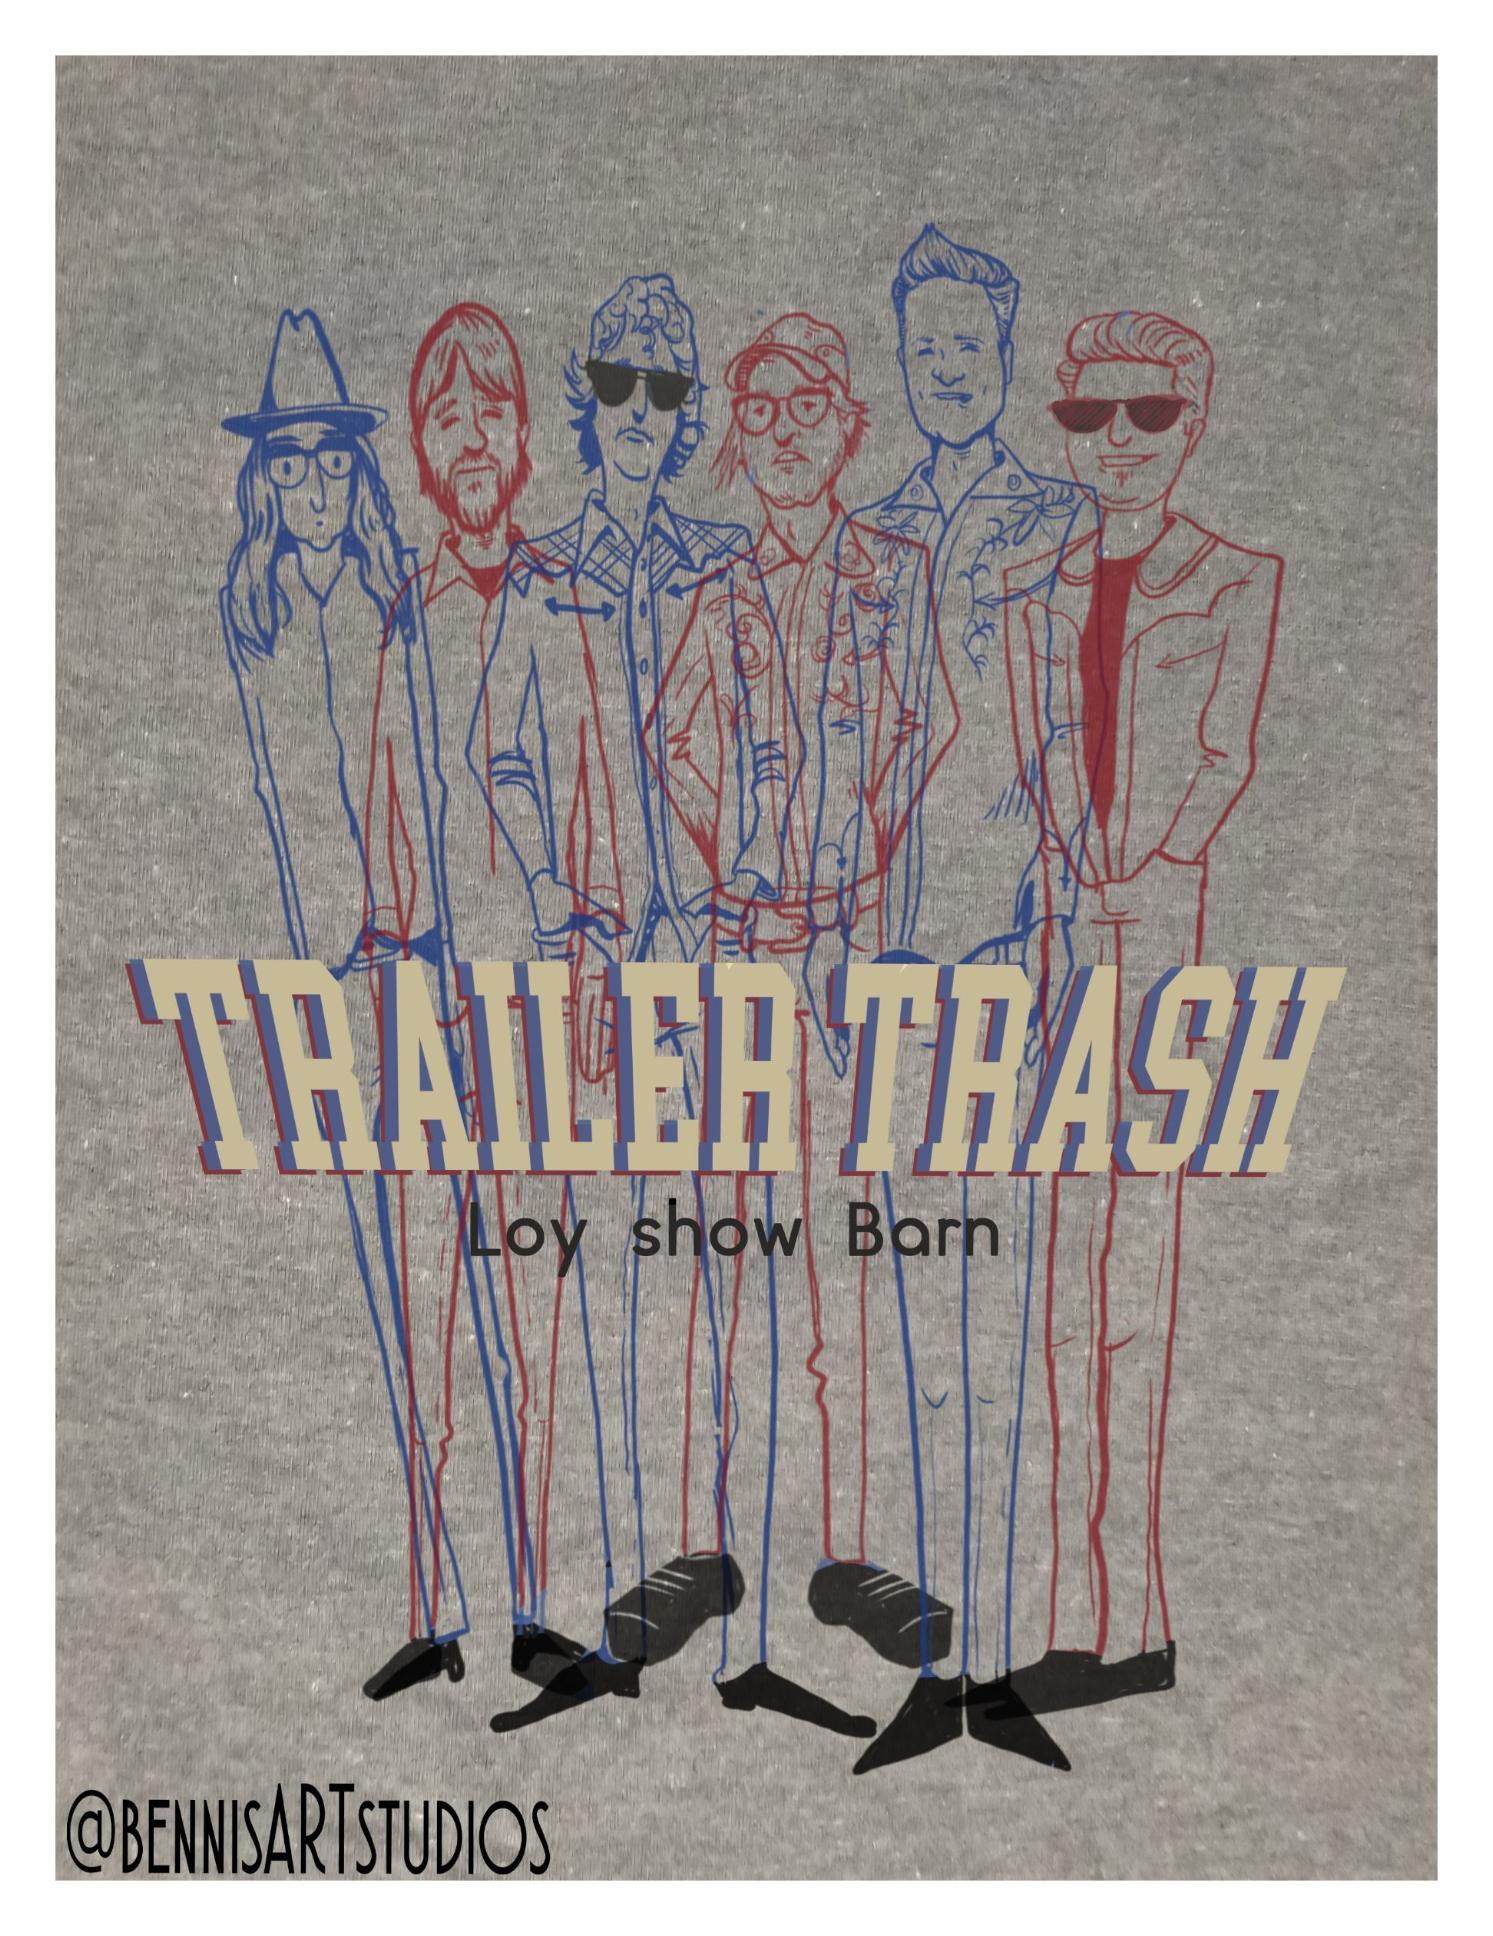 Trailer Trash at Loy Show Barn.